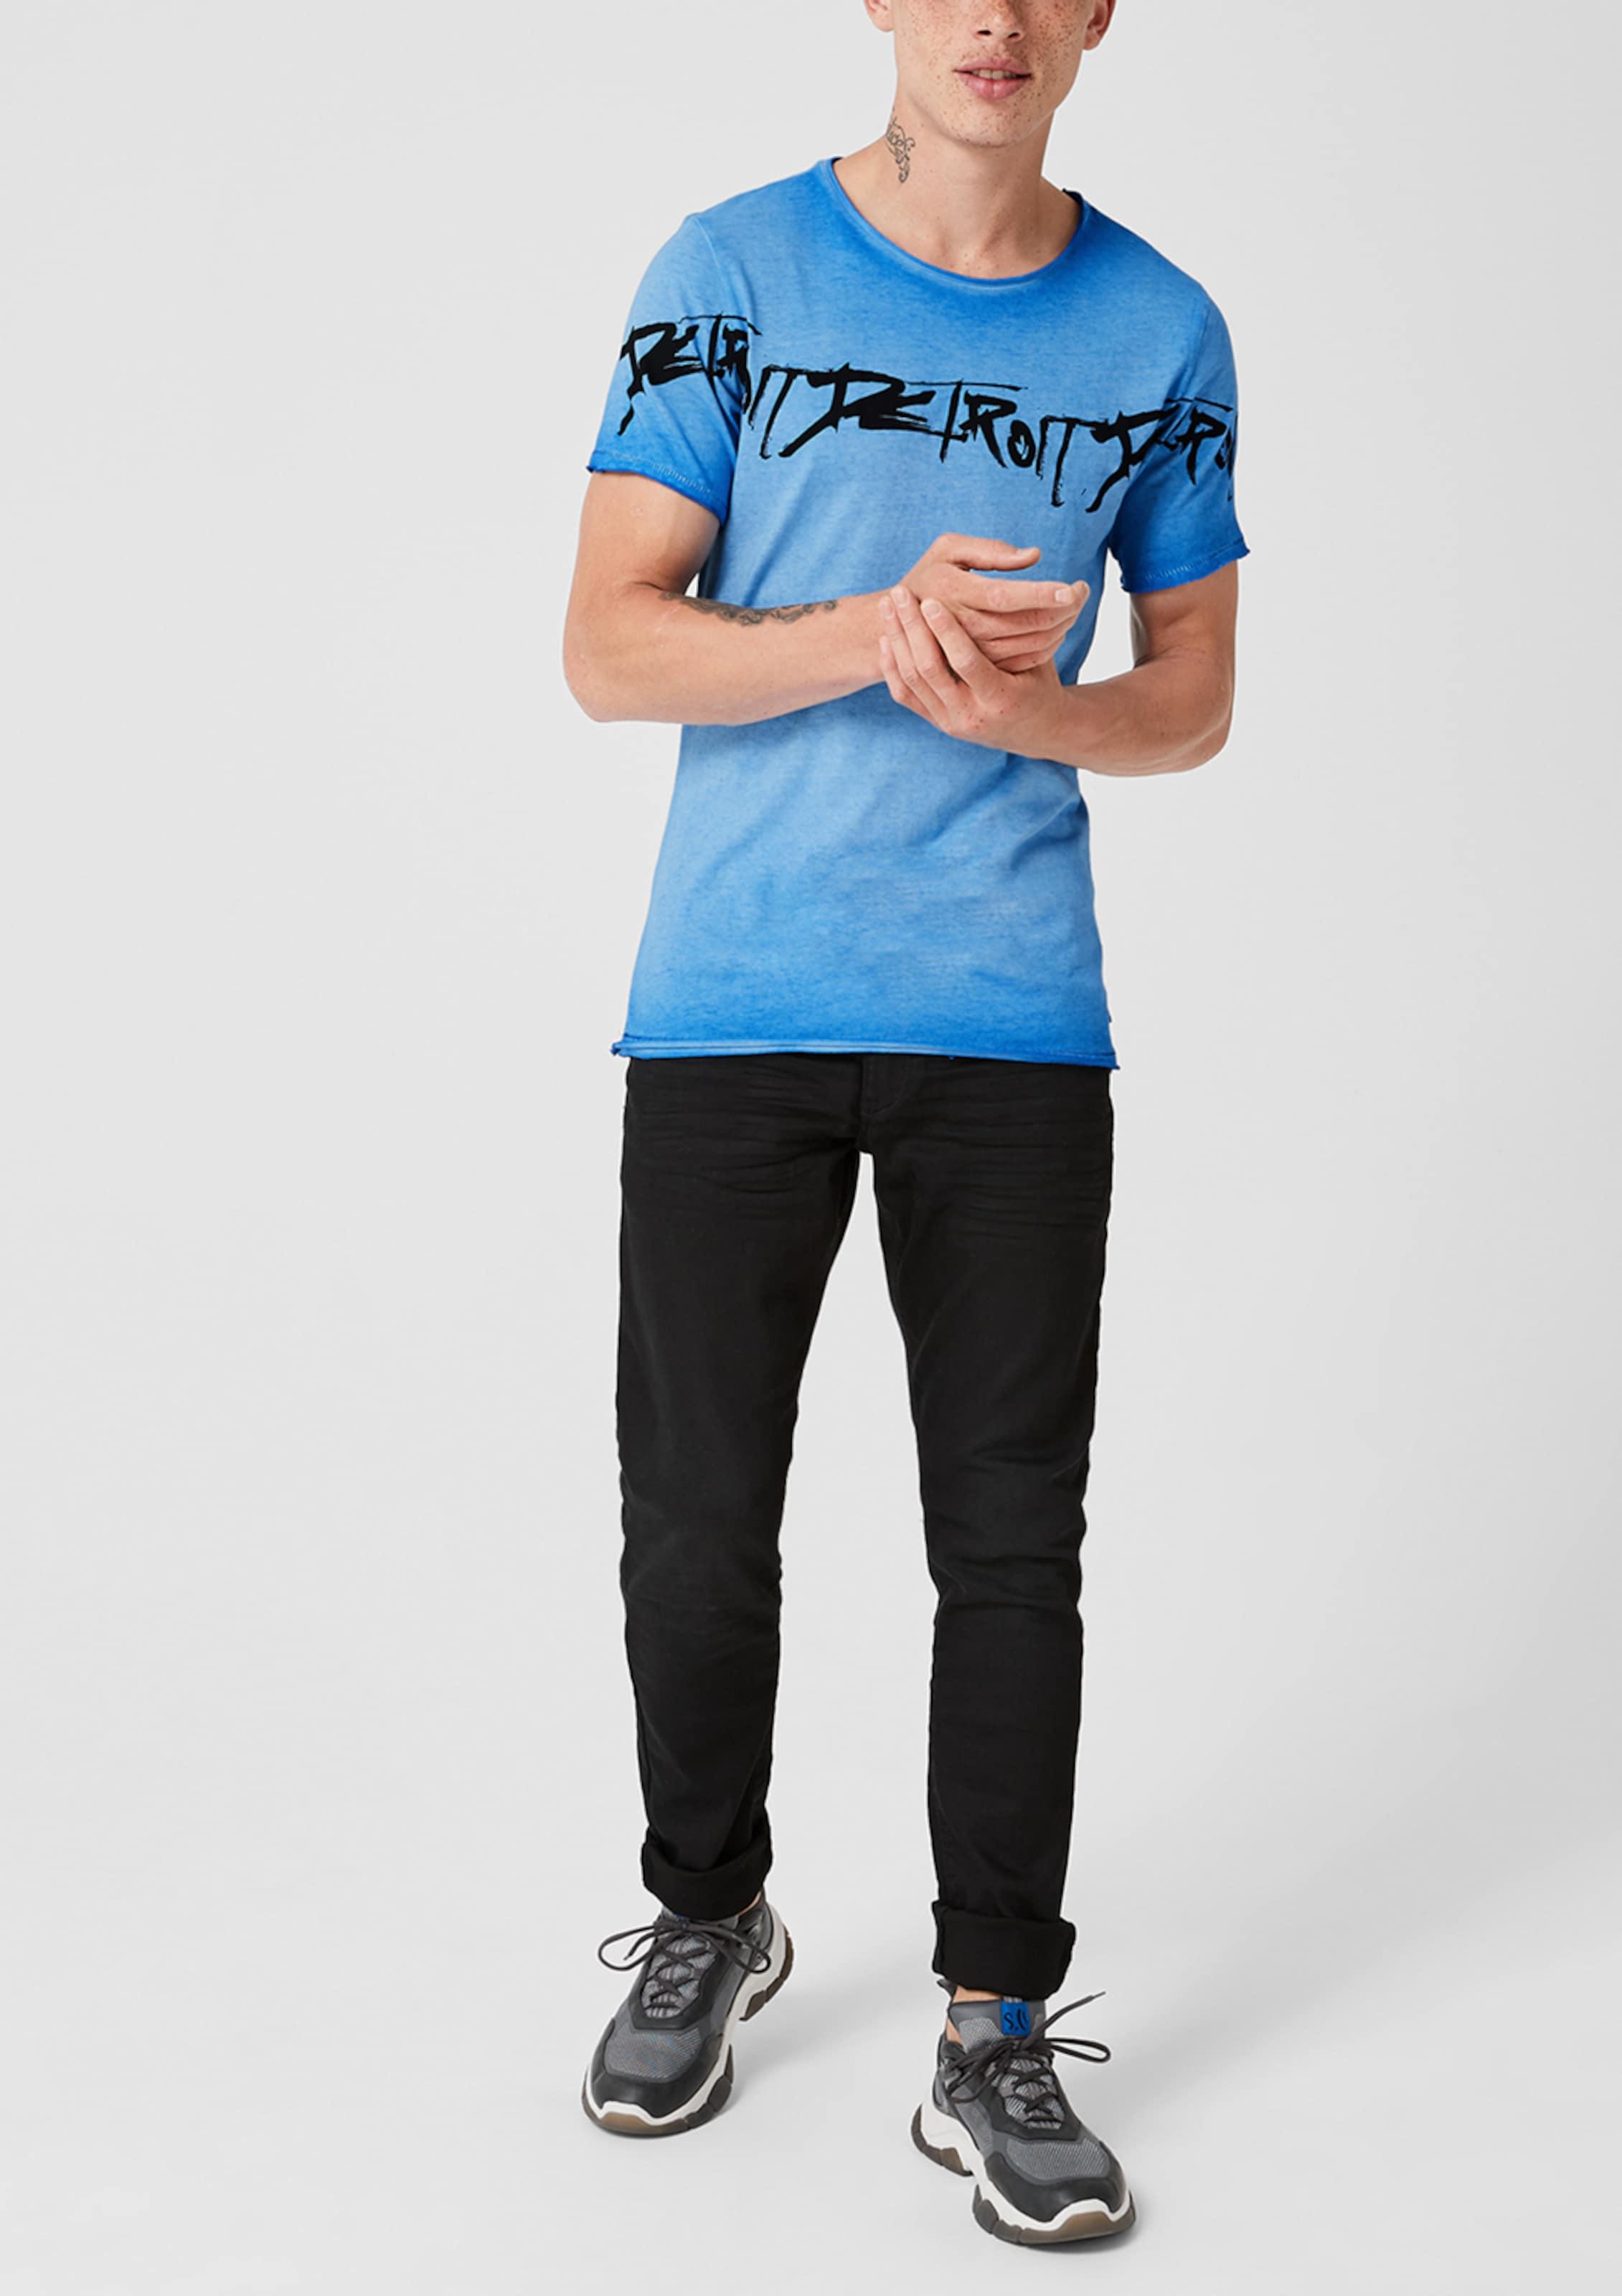 In s shirt Designed T Blau By Q xhQBrCstd